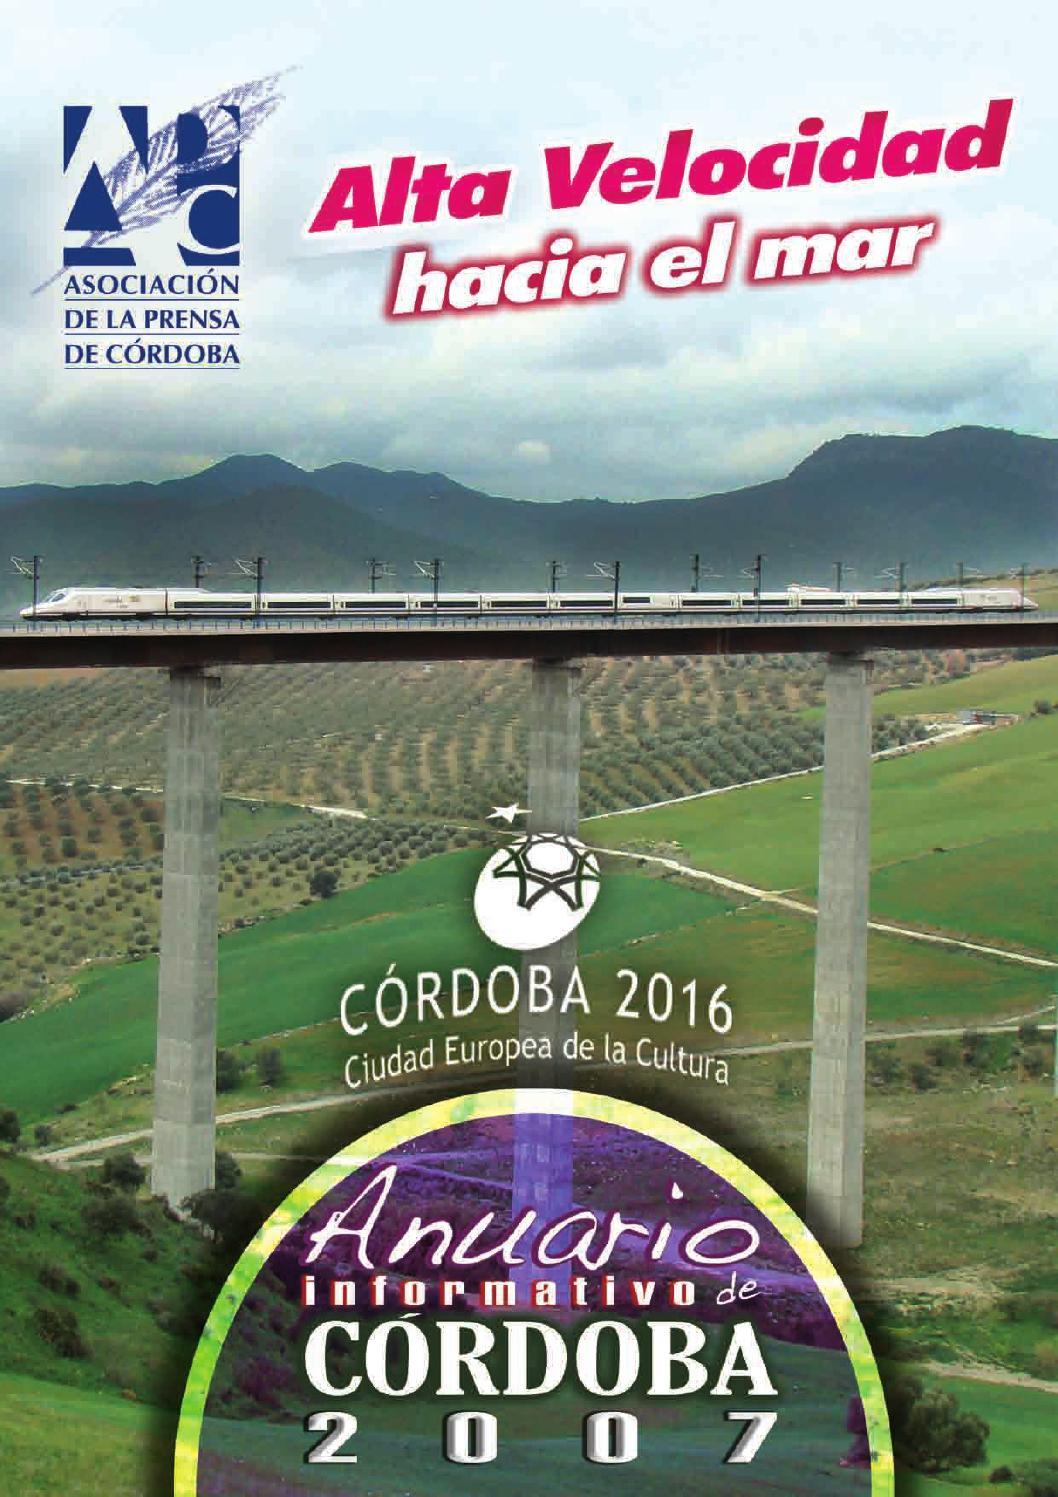 Anuario Informativo de Córdoba 2007 by Asprencor - issuu 881b22531f942